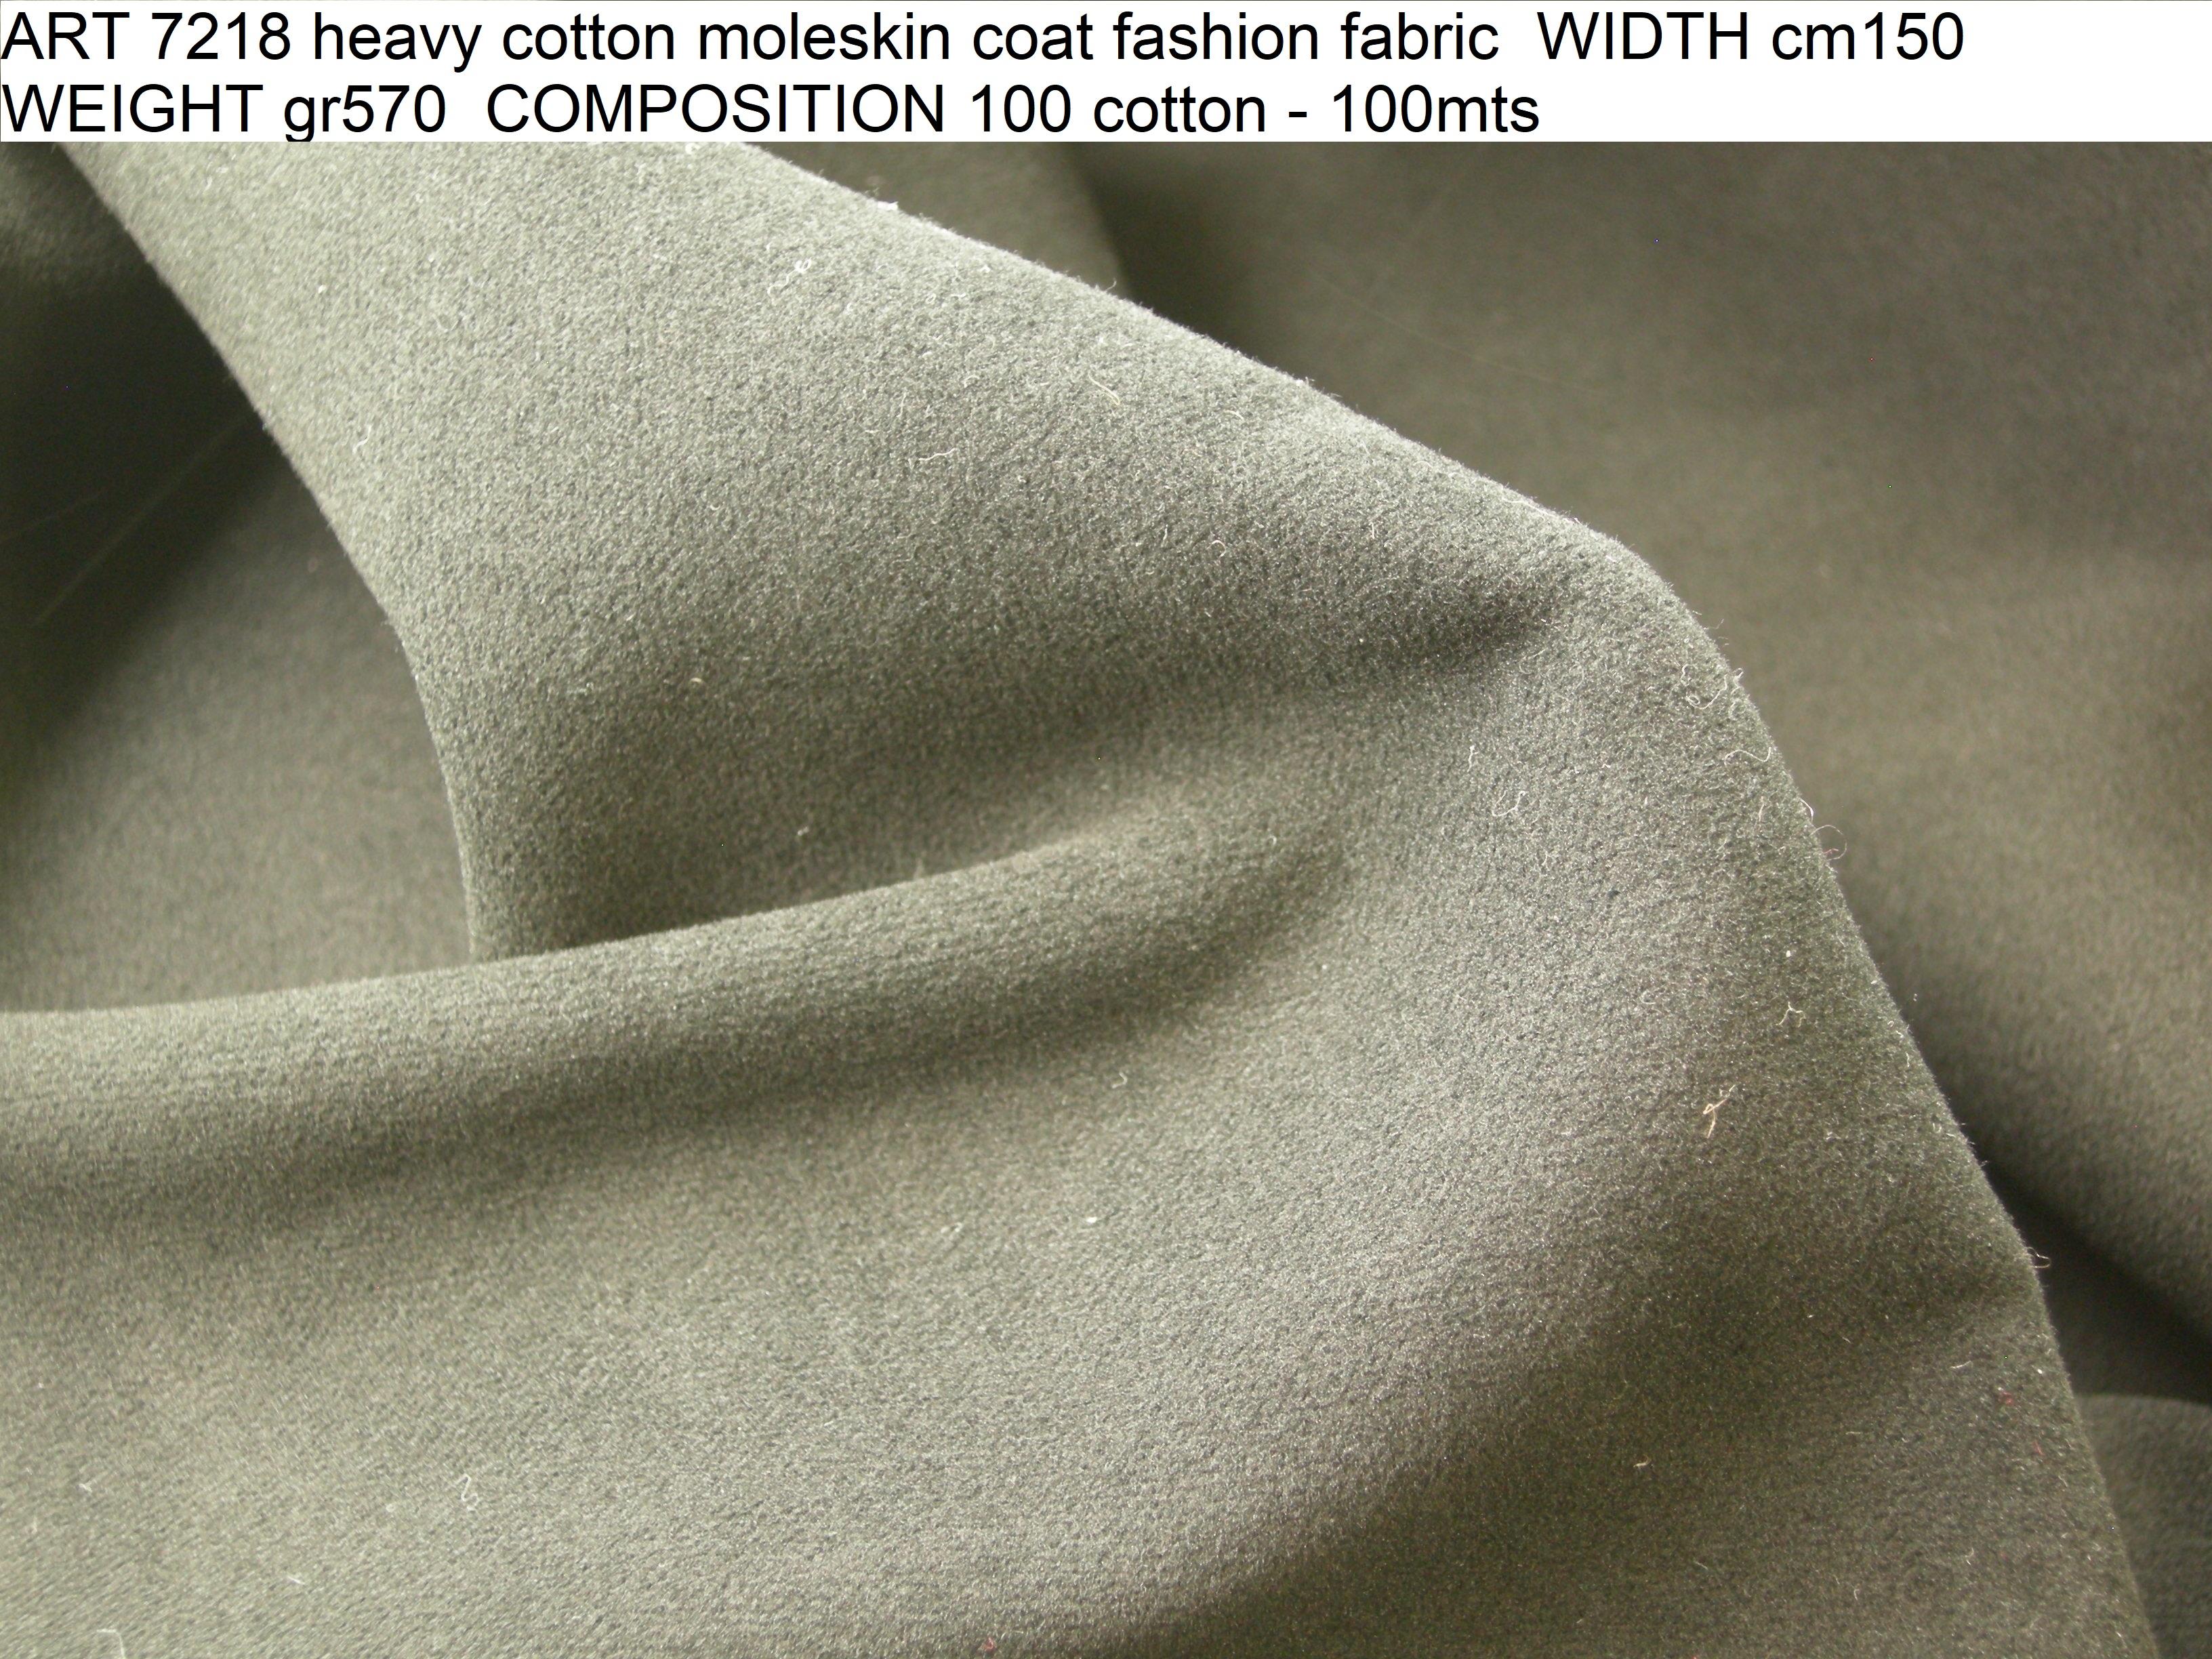 ART 7218 heavy cotton moleskin coat fashion fabric WIDTH cm150 WEIGHT gr570 COMPOSITION 100 cotton - 100mts